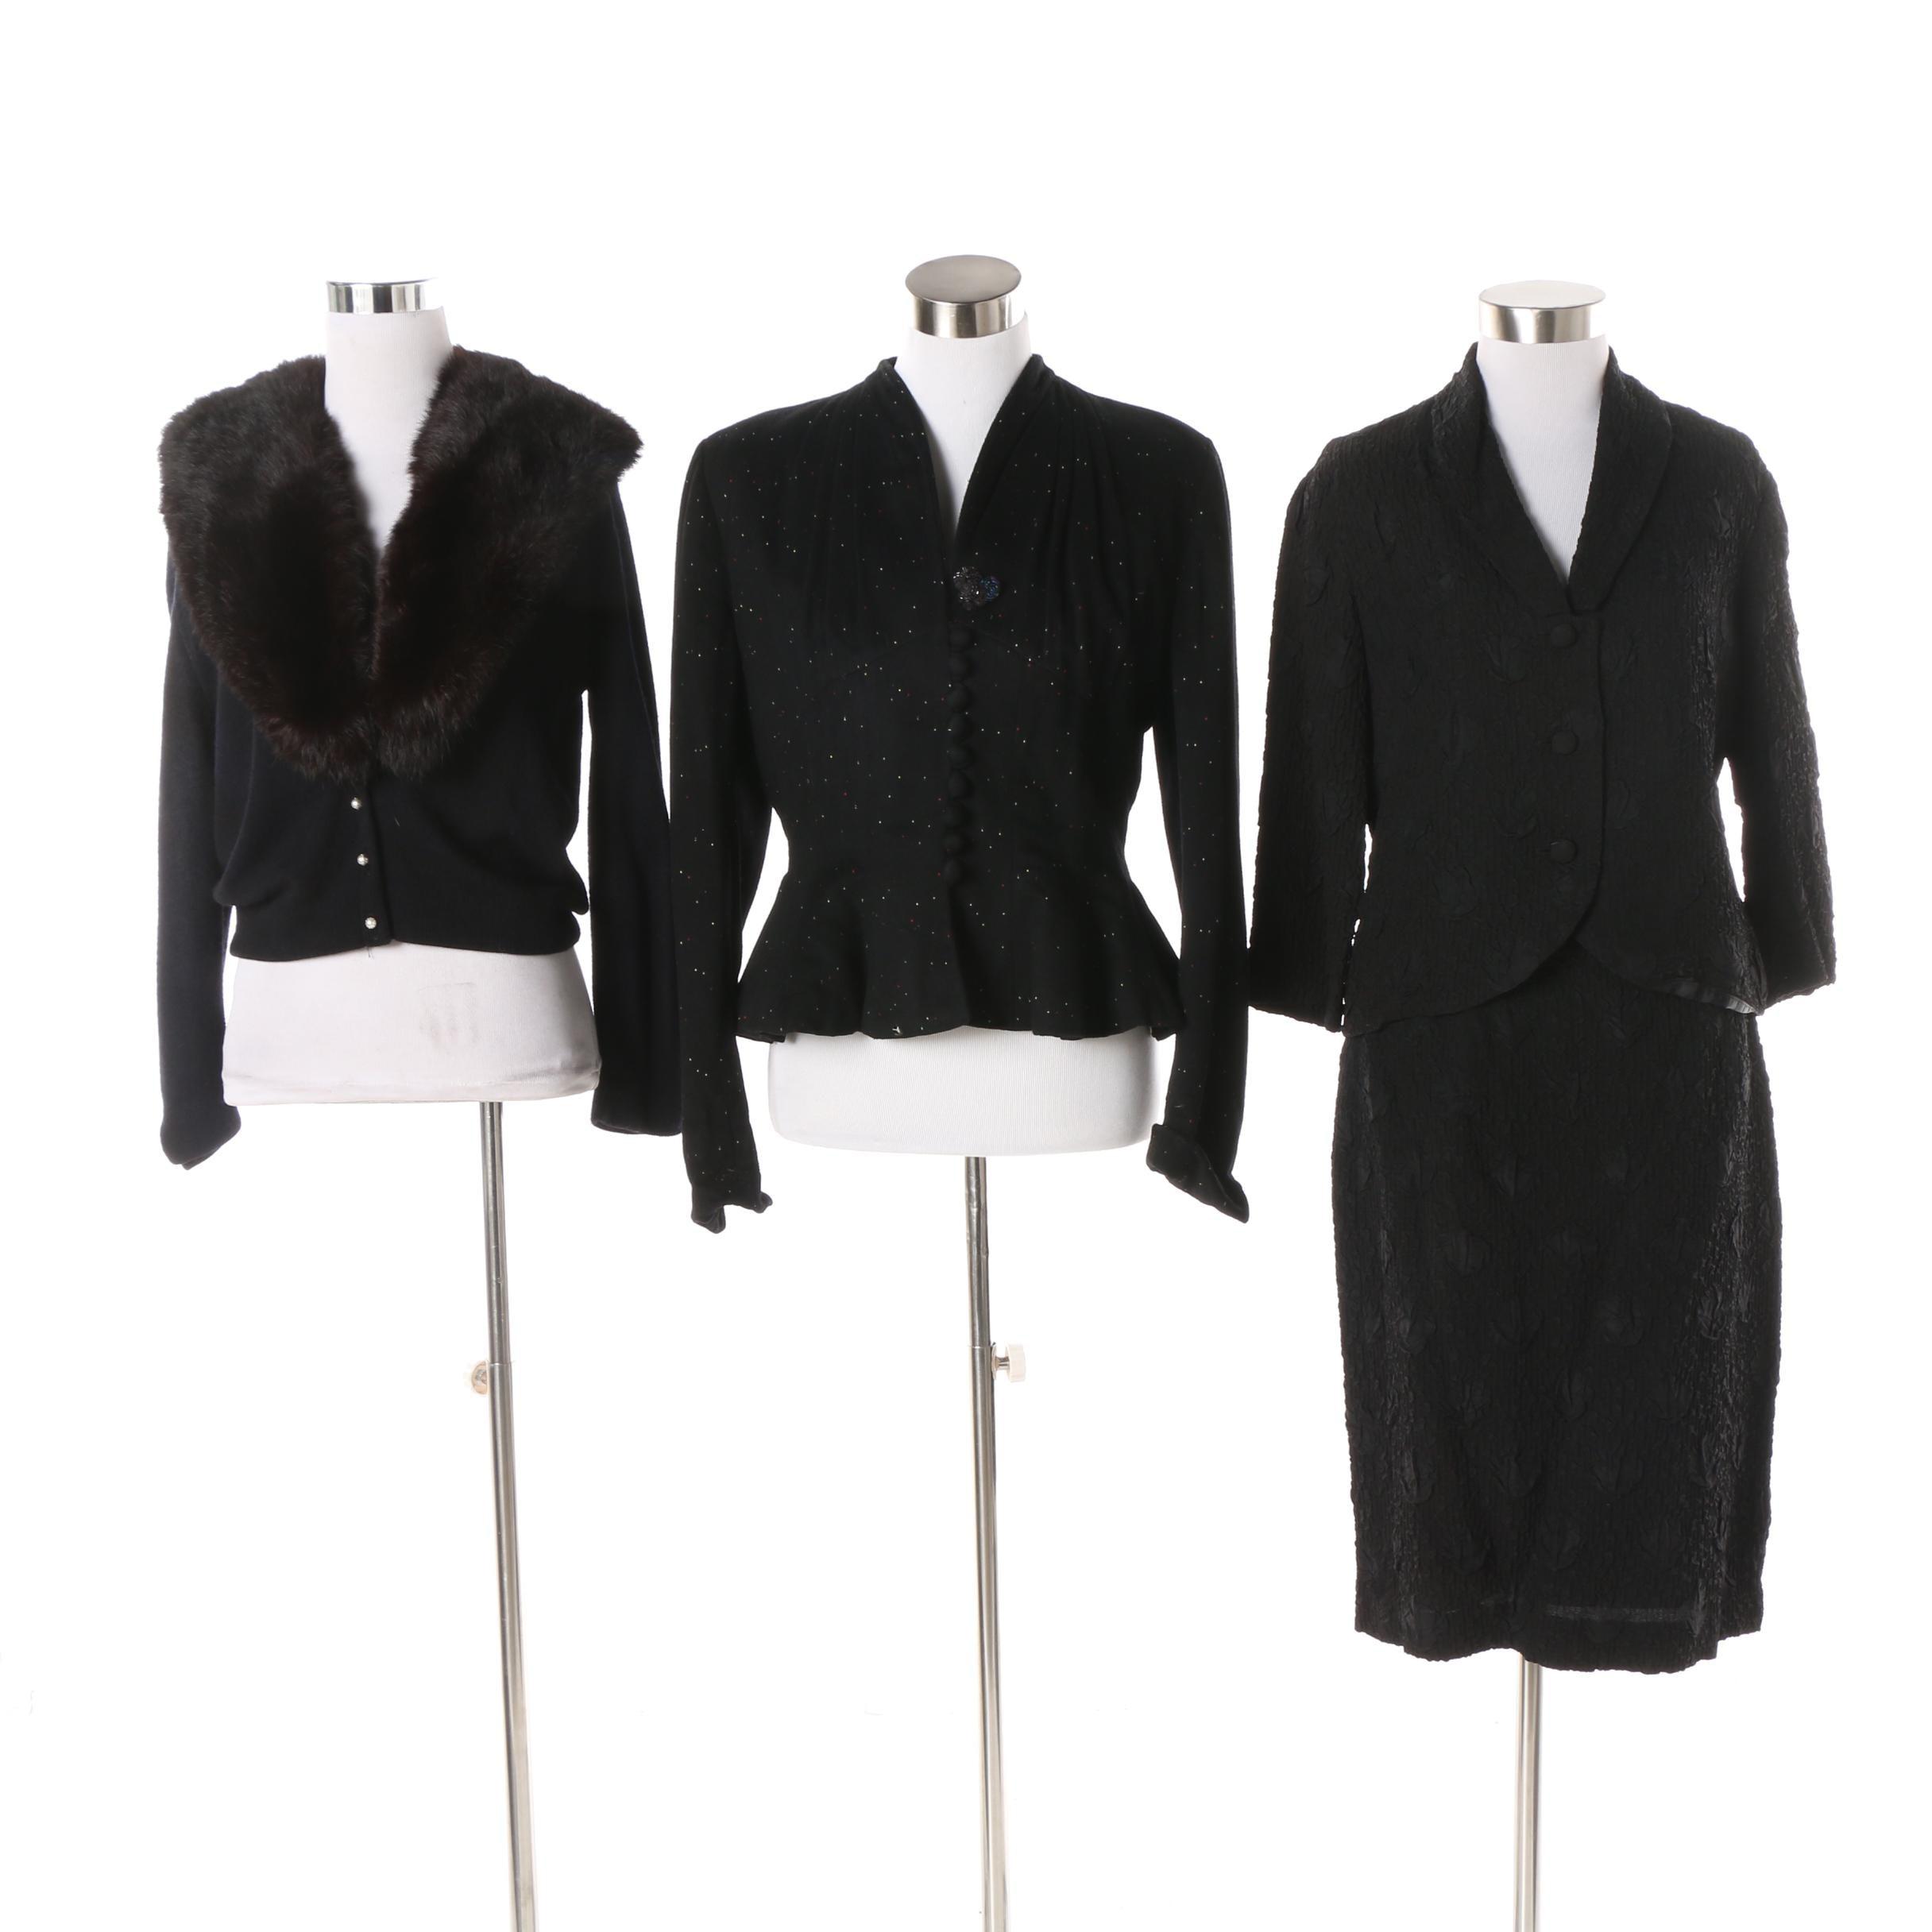 Vintage Rabbit Fur Collar Sweater, Lilli Ann Jacket and Unlabeled Skirt Suit